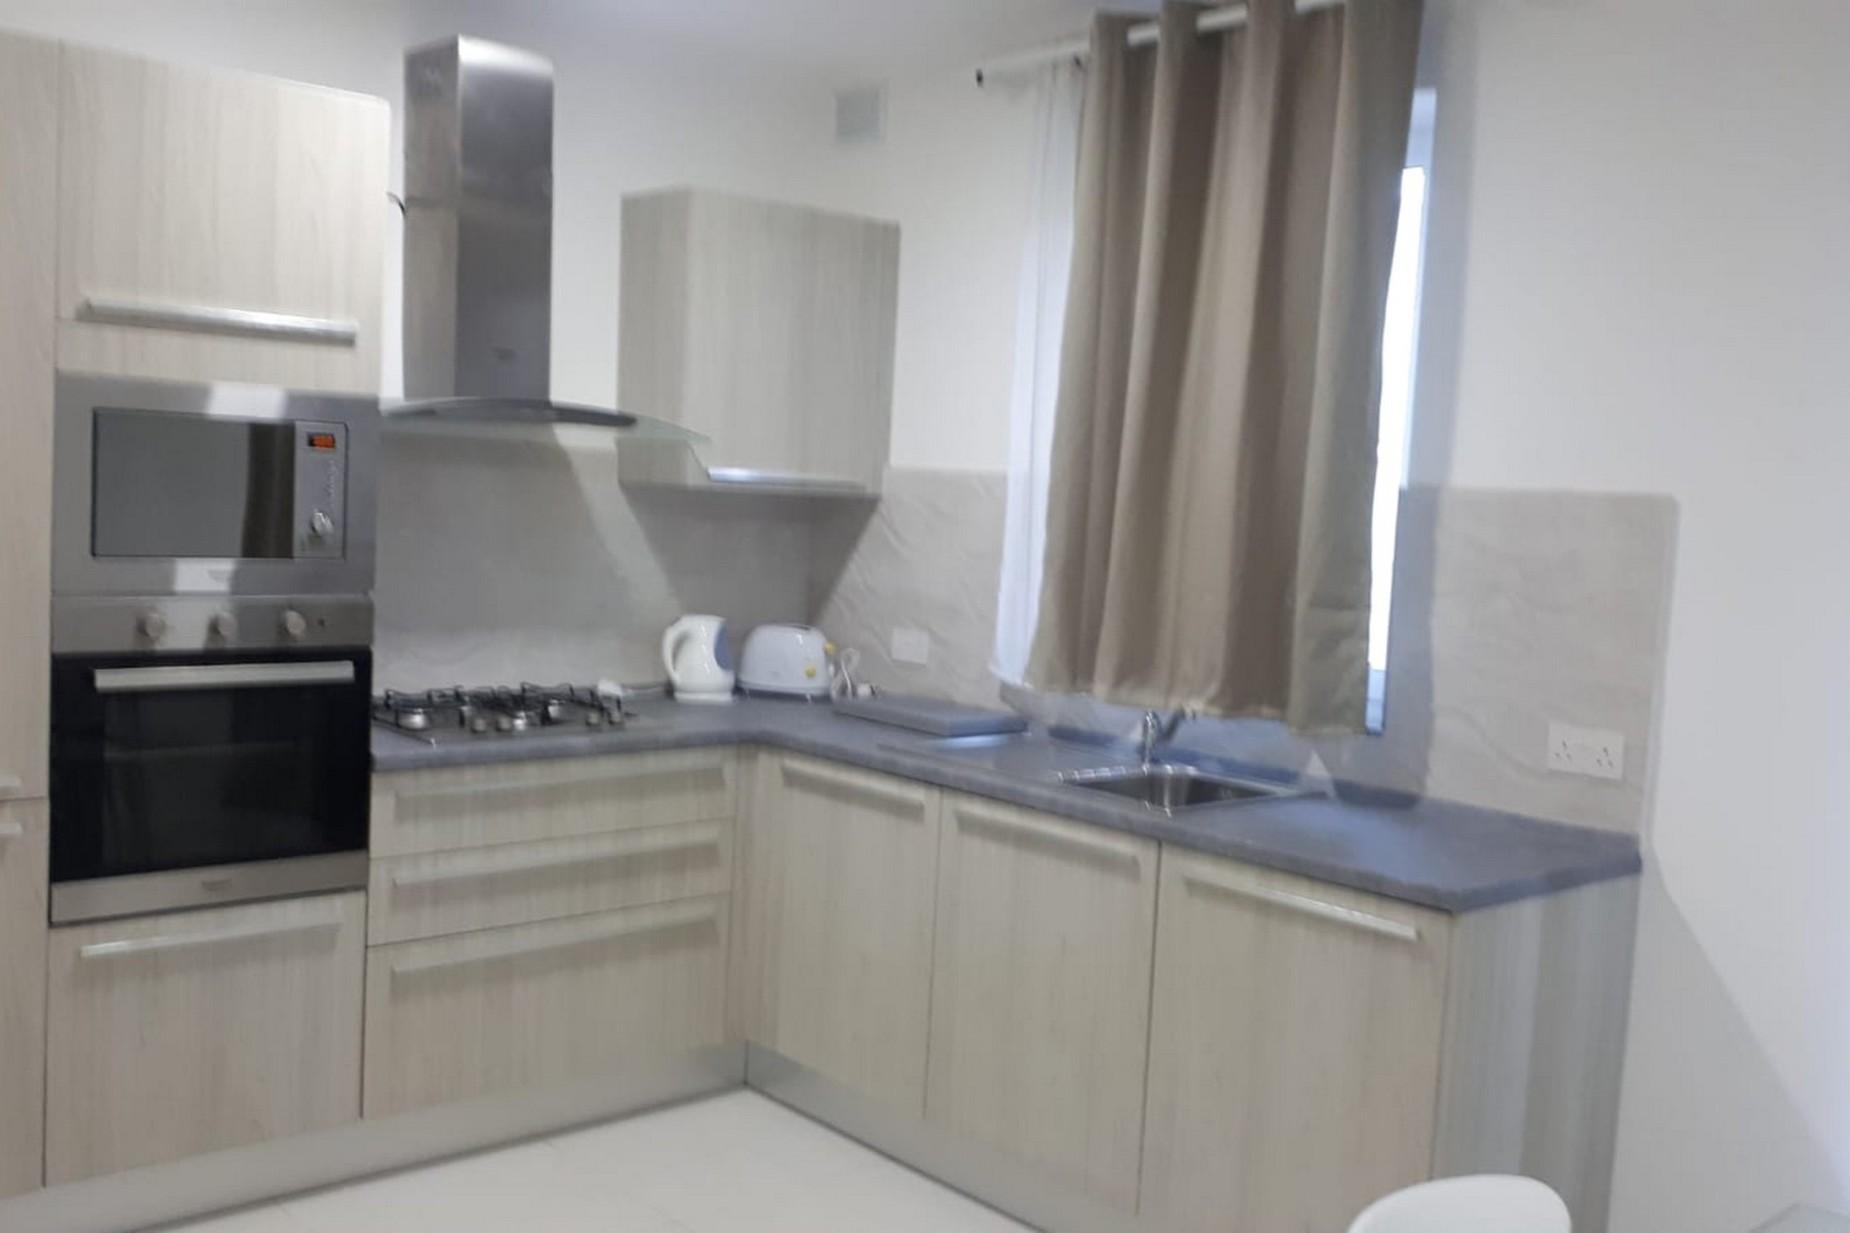 3 bed Apartment For Rent in Rabat, Rabat - thumb 4